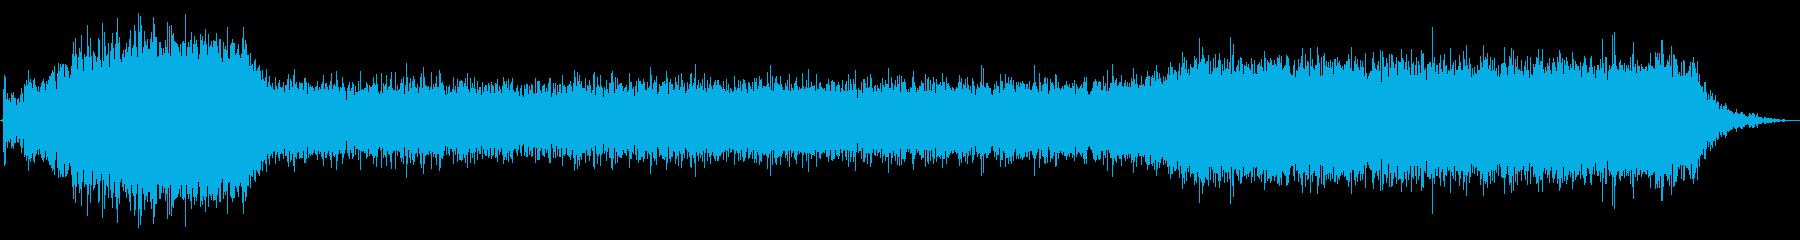 PC 駆動音02-02(オンオフ)の再生済みの波形